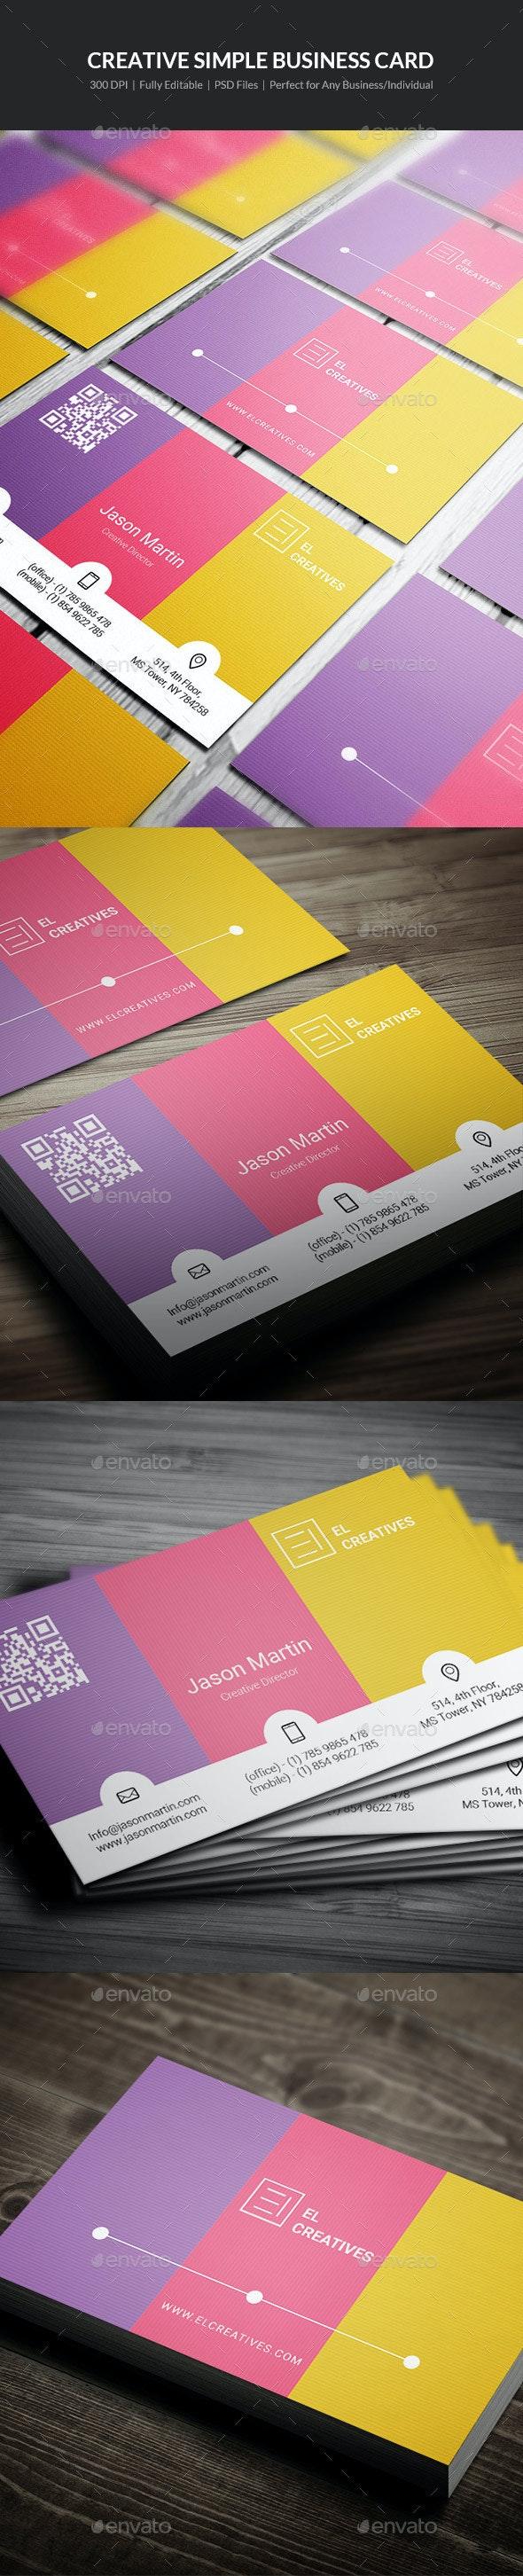 Creative Simple Business Card - 06 - Creative Business Cards